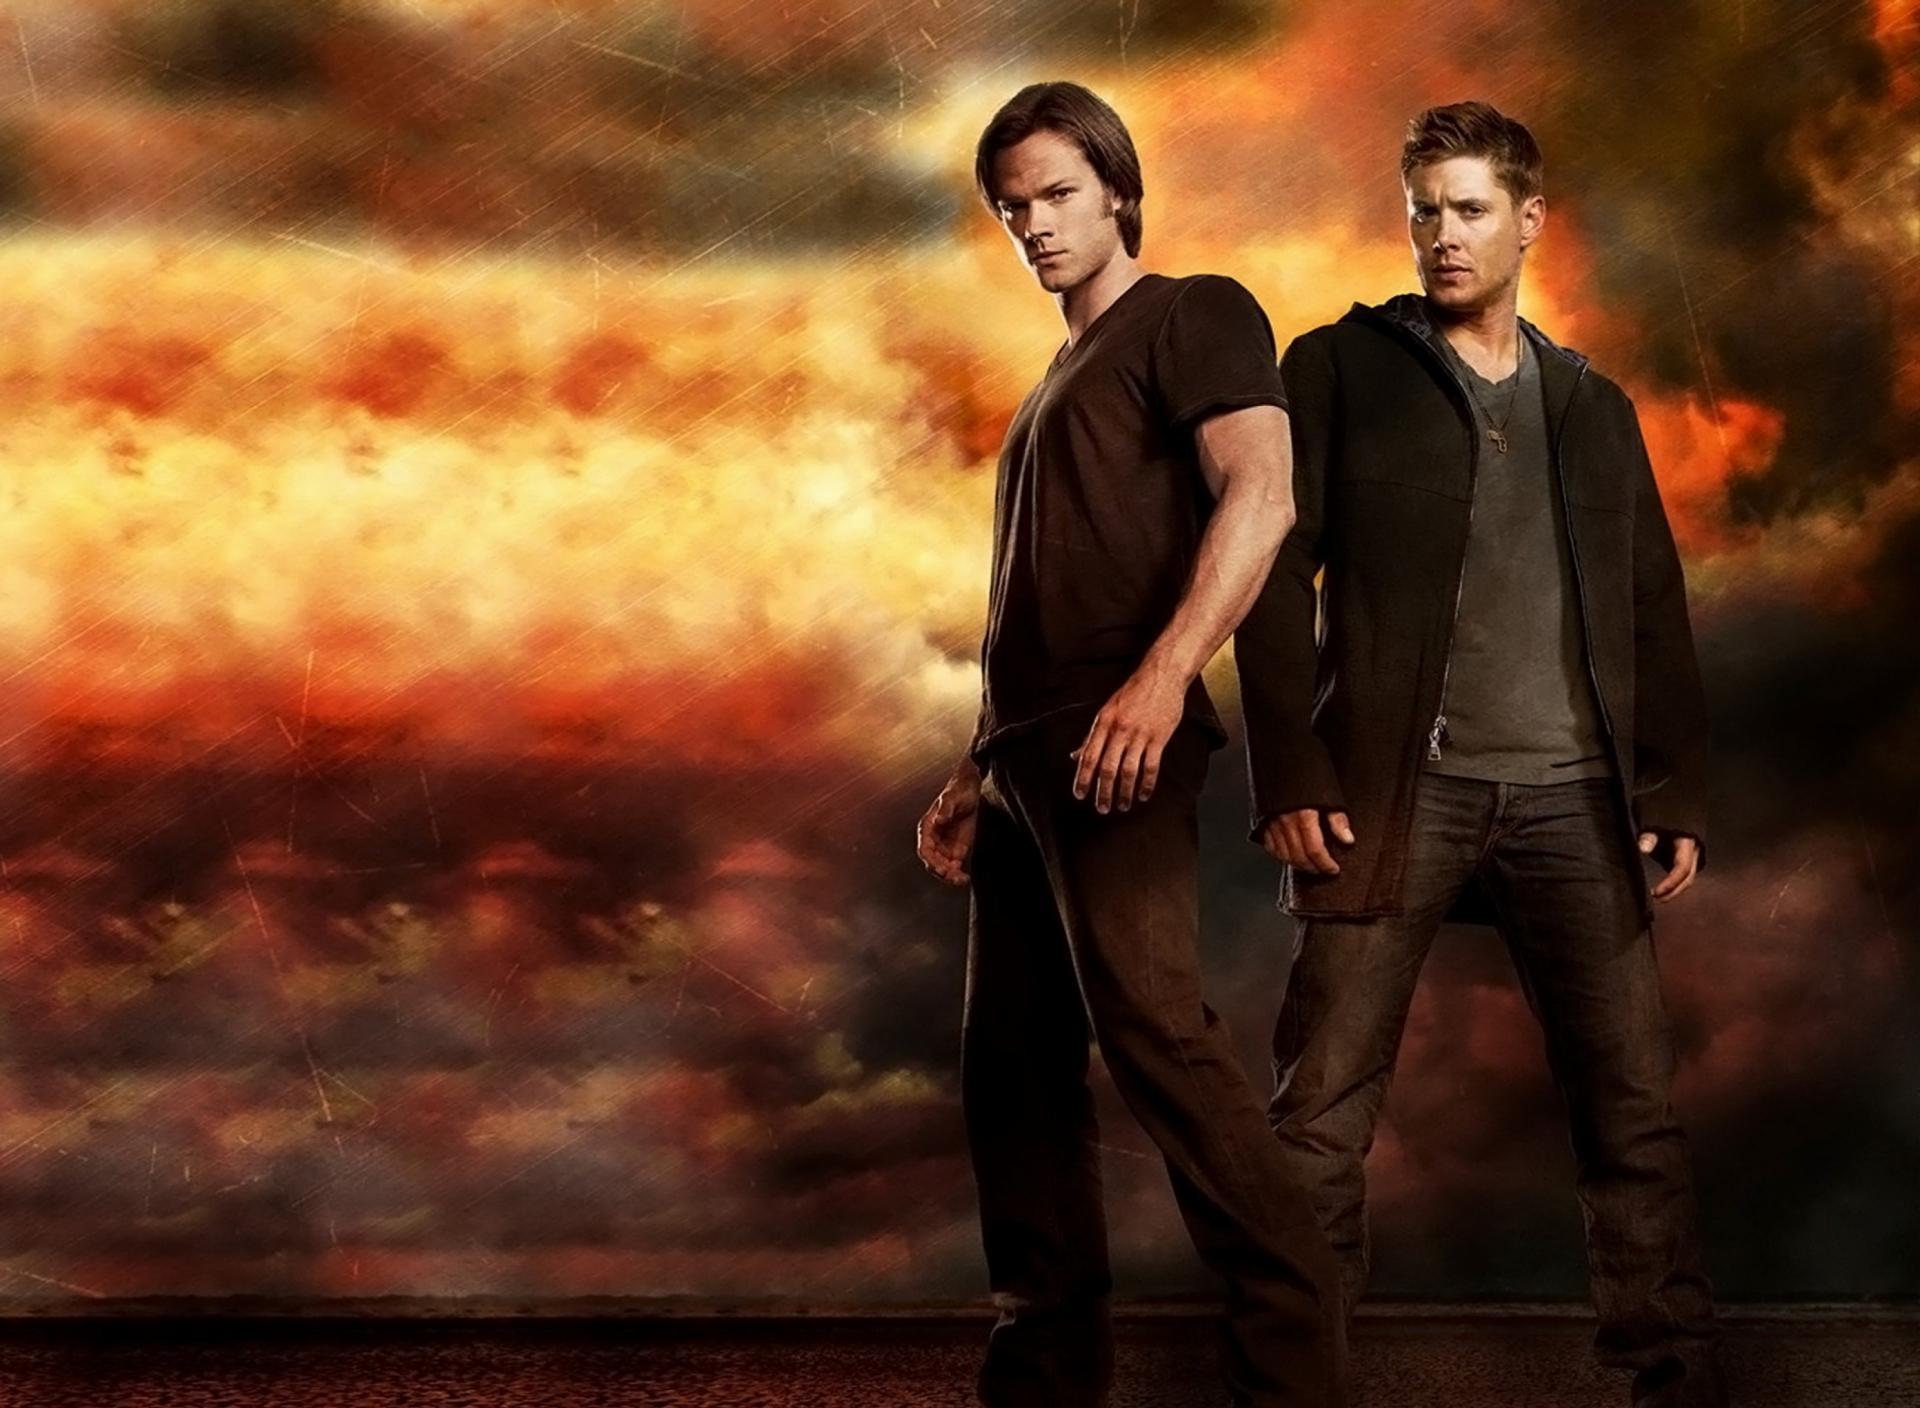 Supernatural-PC-Wallpaper-